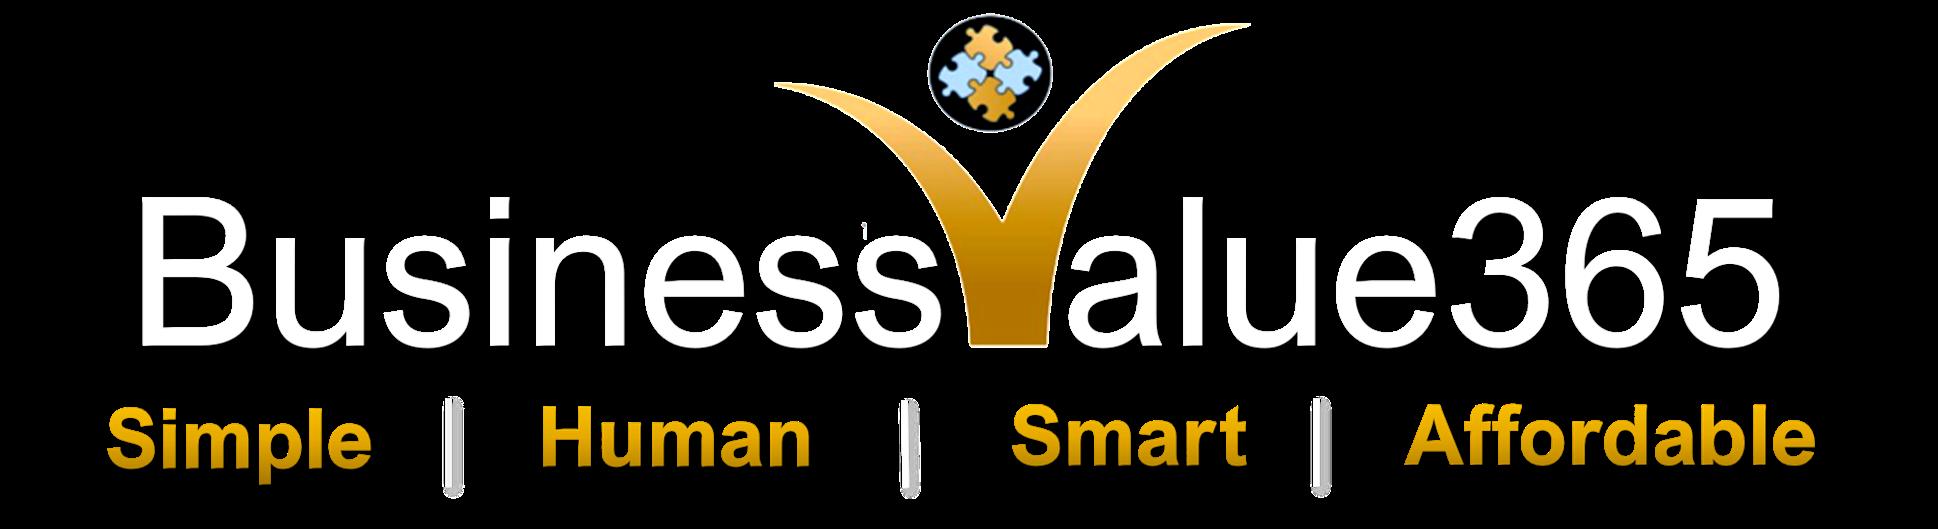 BusinessValue365